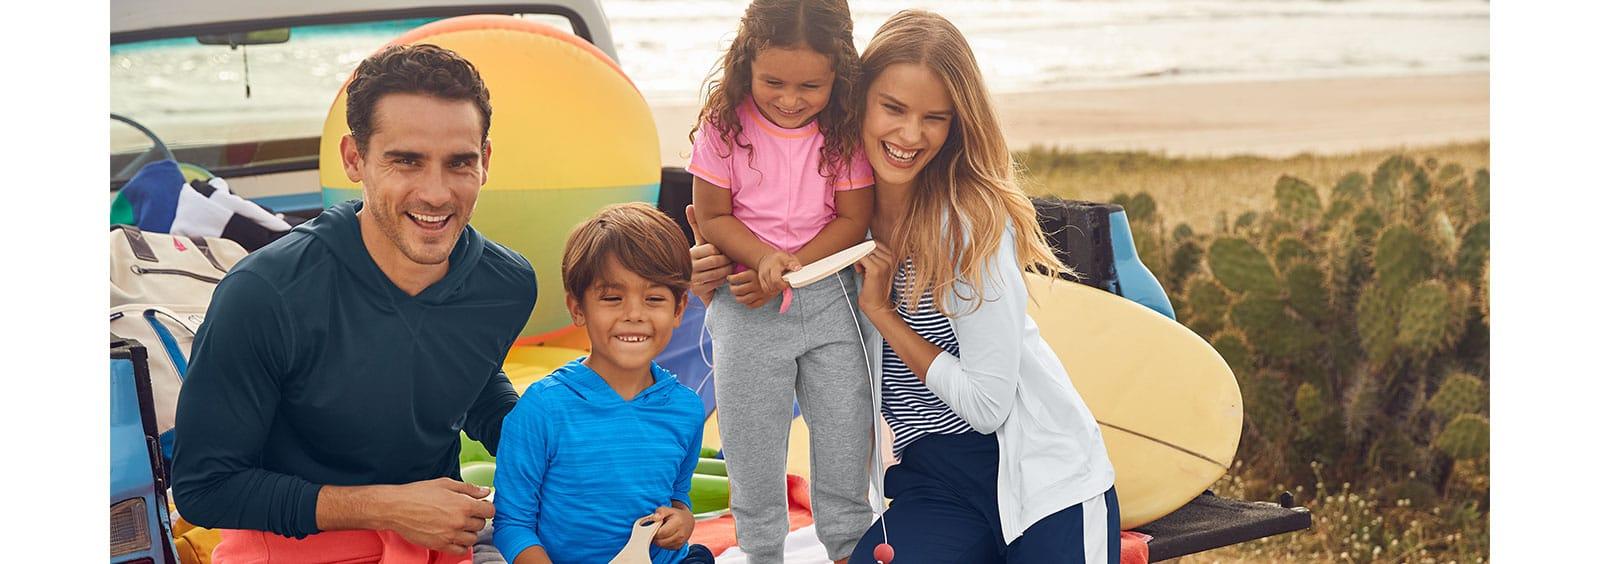 Family Essentials for Spring Break 2020   Lands' End